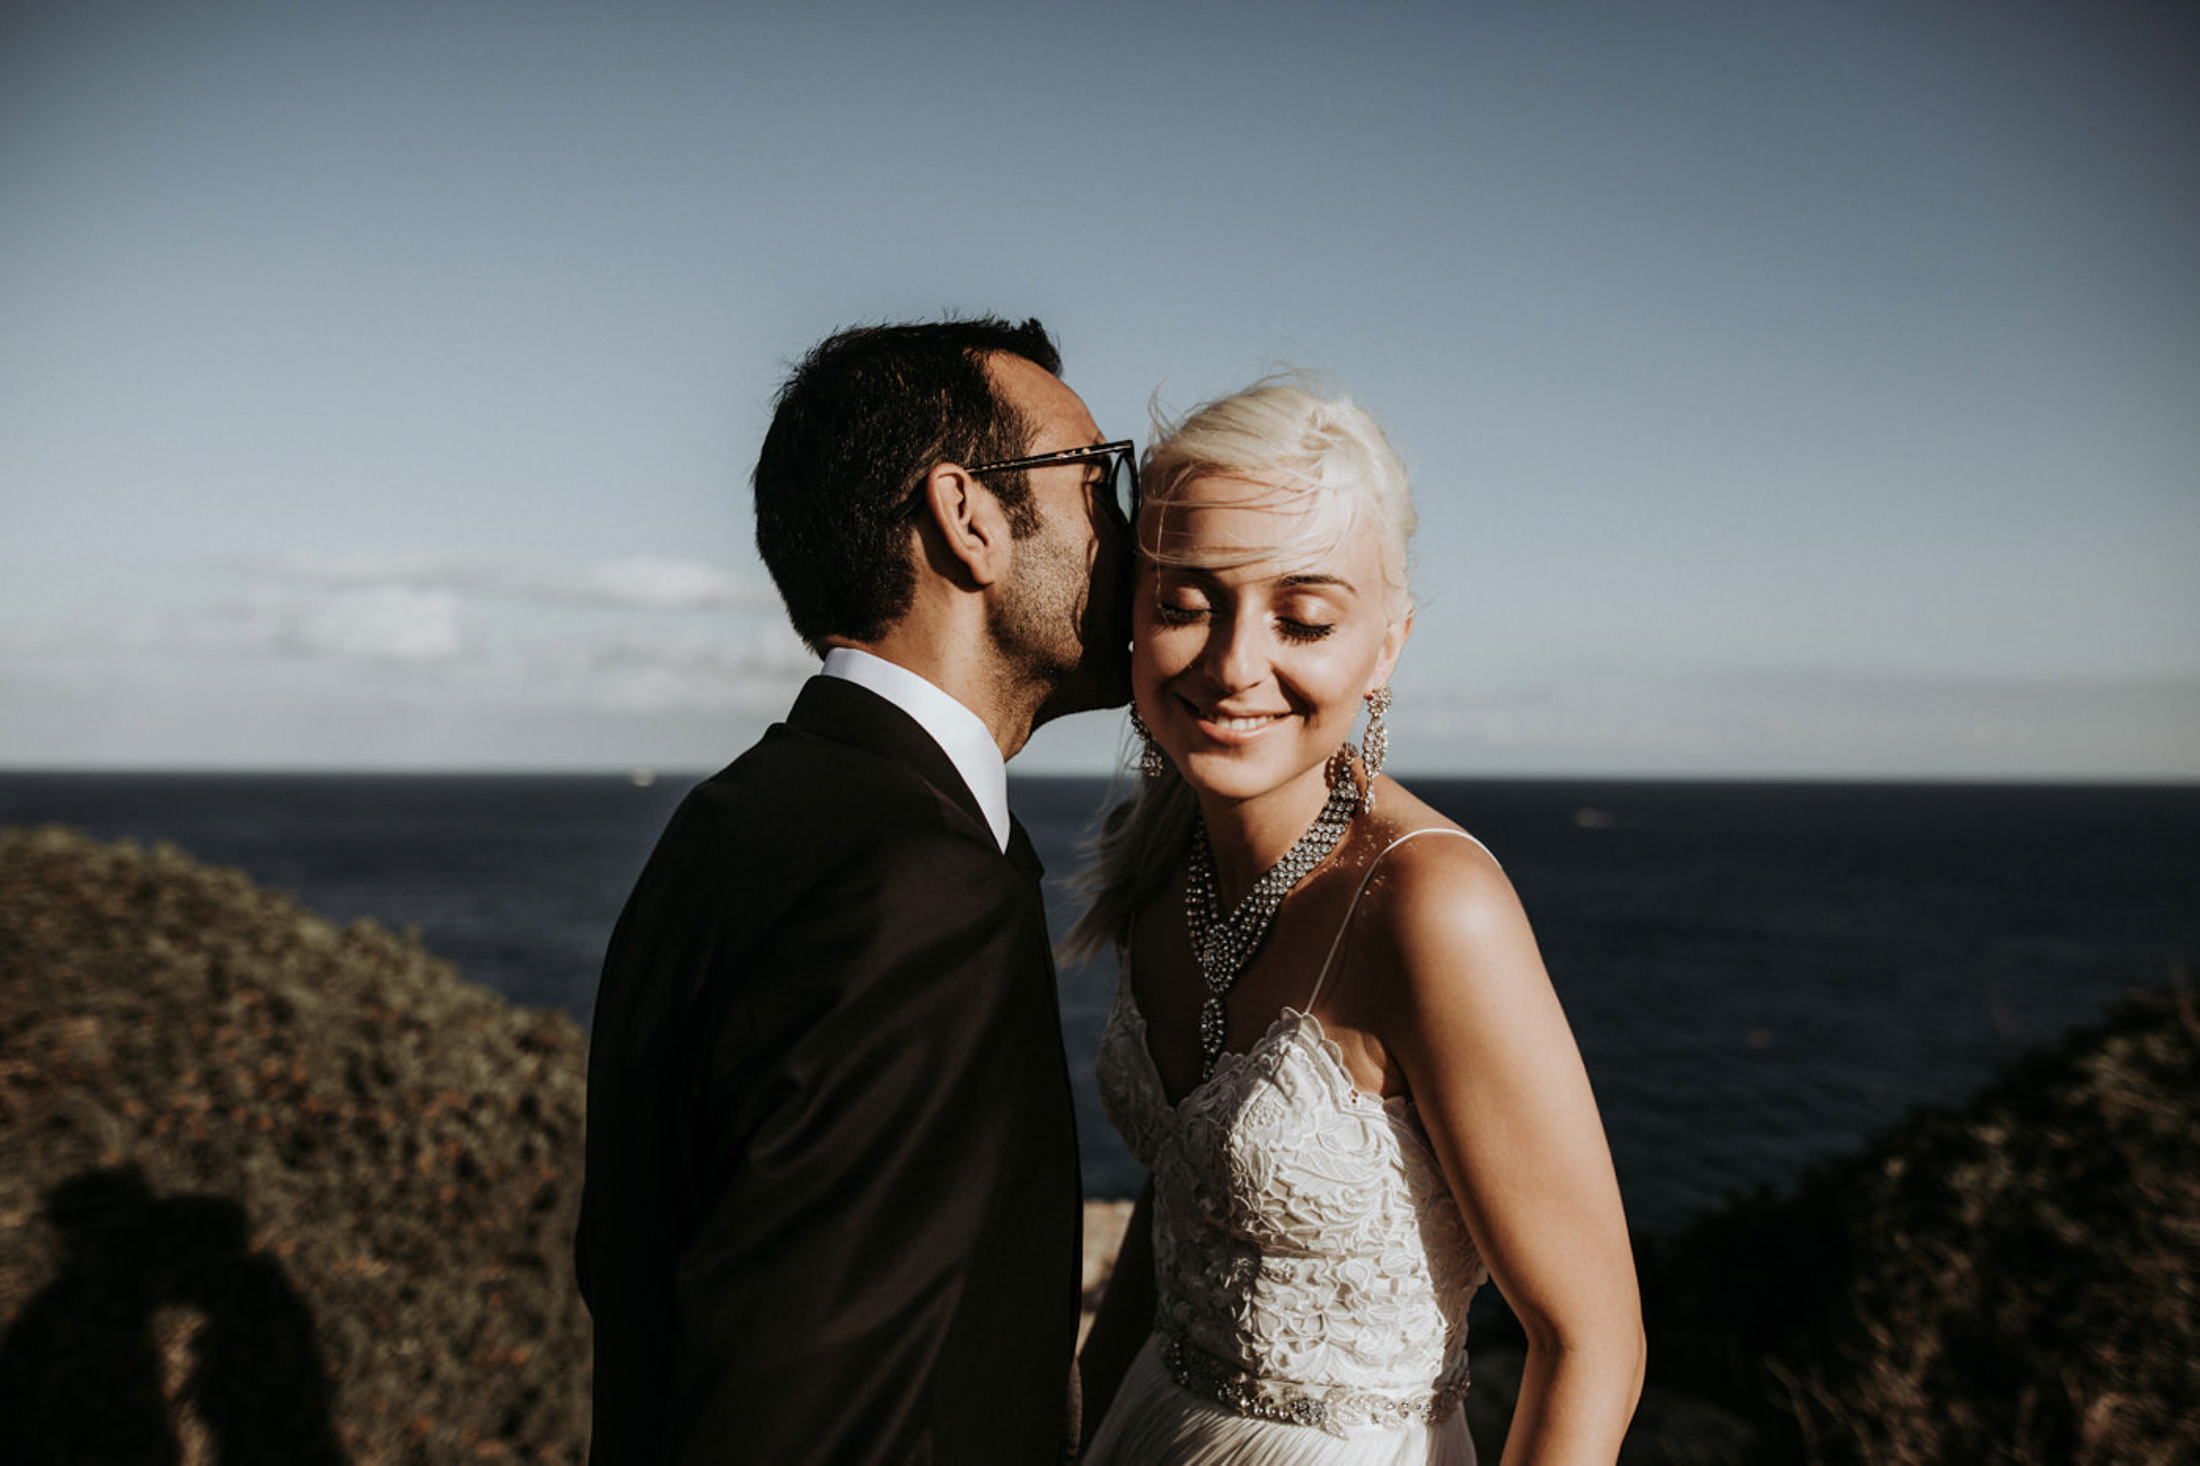 Wedding_Photographer_Mallorca_Daniela-Marquardt_Photography_New_York_Iceland_Tuscany_Santorini_Portugal_Austria_Bavaria_Elopement_Hochzeitsfotograf_AntjeRajat2_87